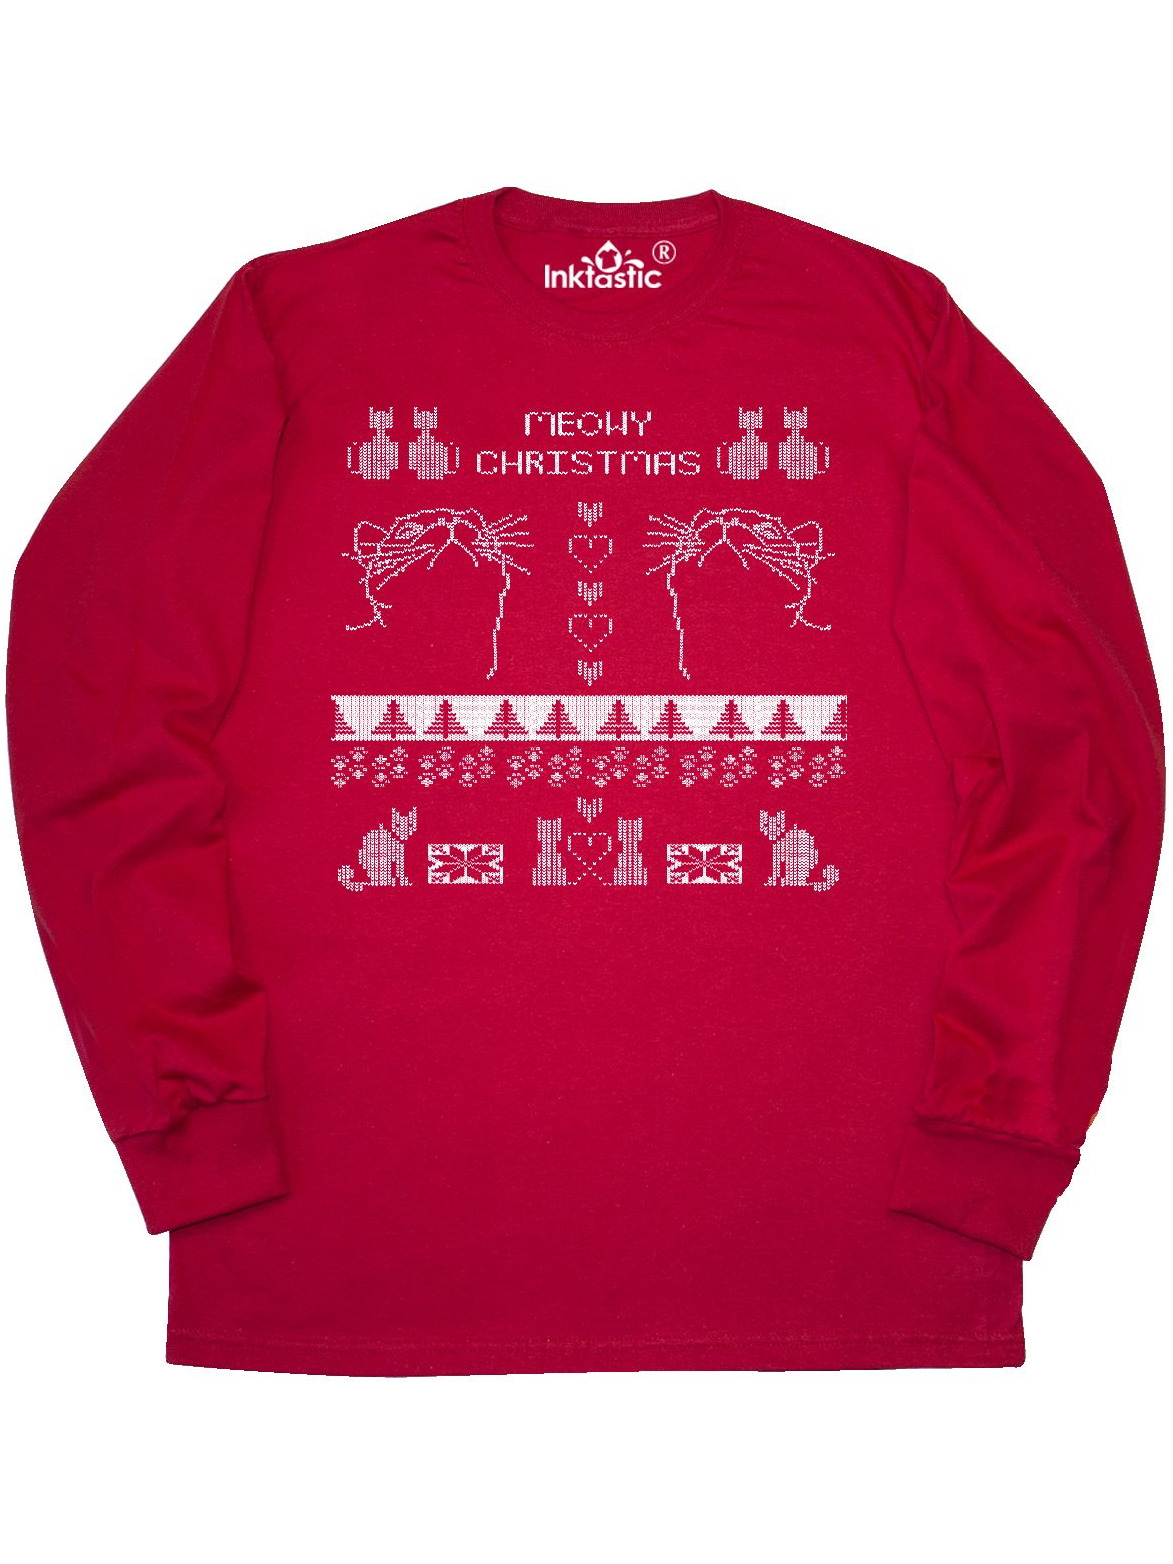 Meowy Christmas Sweater.Meowy Christmas Faux Christmas Sweater Long Sleeve T Shirt